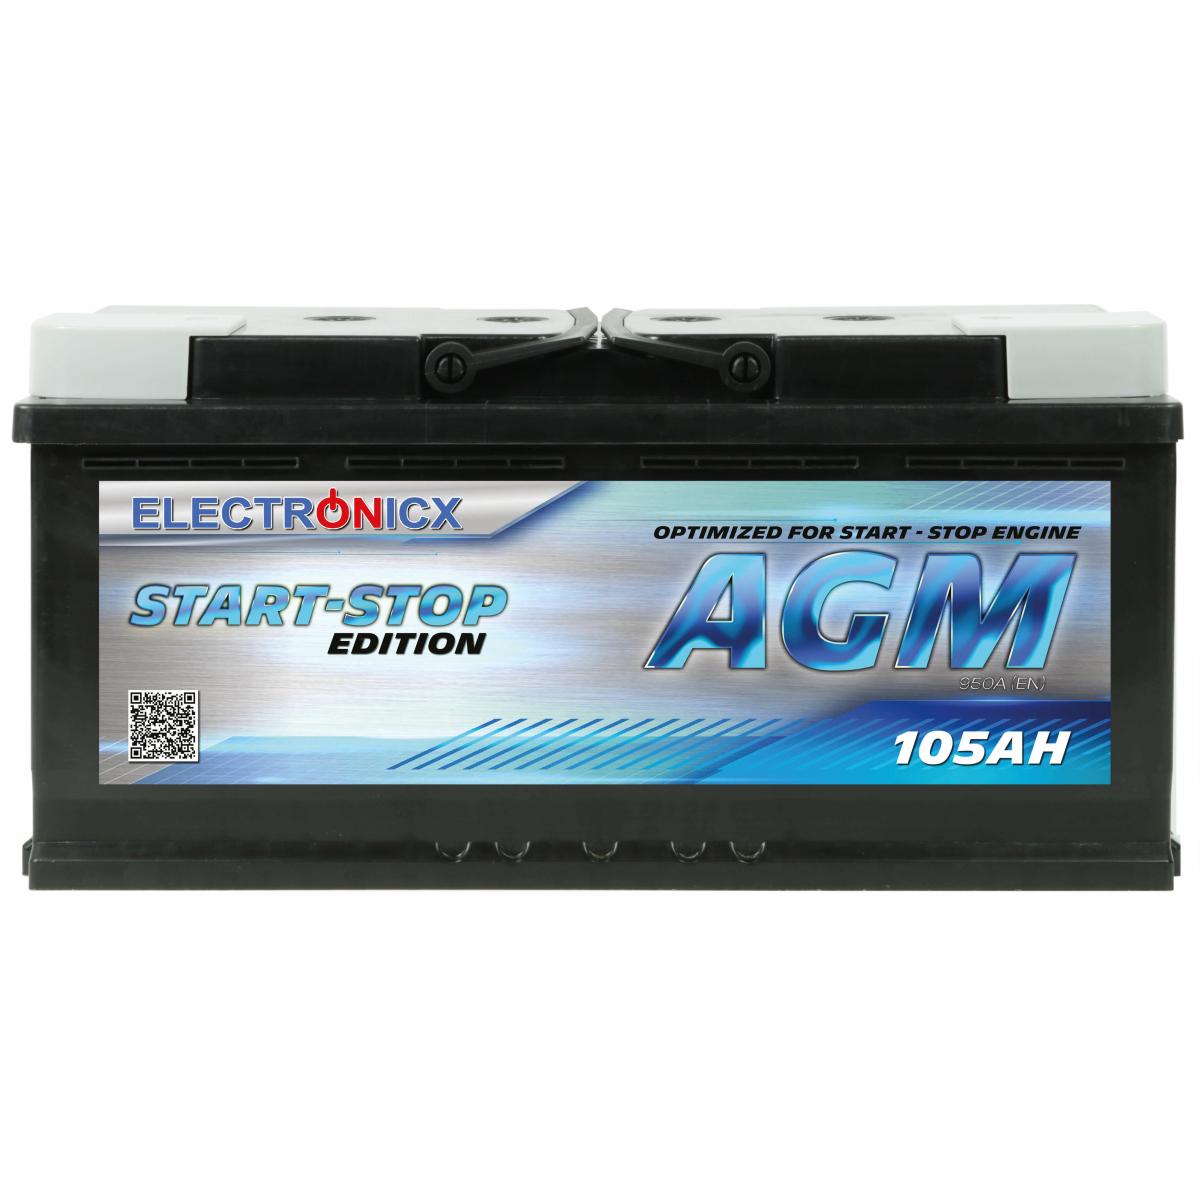 Electronicx AGM Autobatterie Starterbatterie Batterie Start-Stop 105 AH 12V 1200A